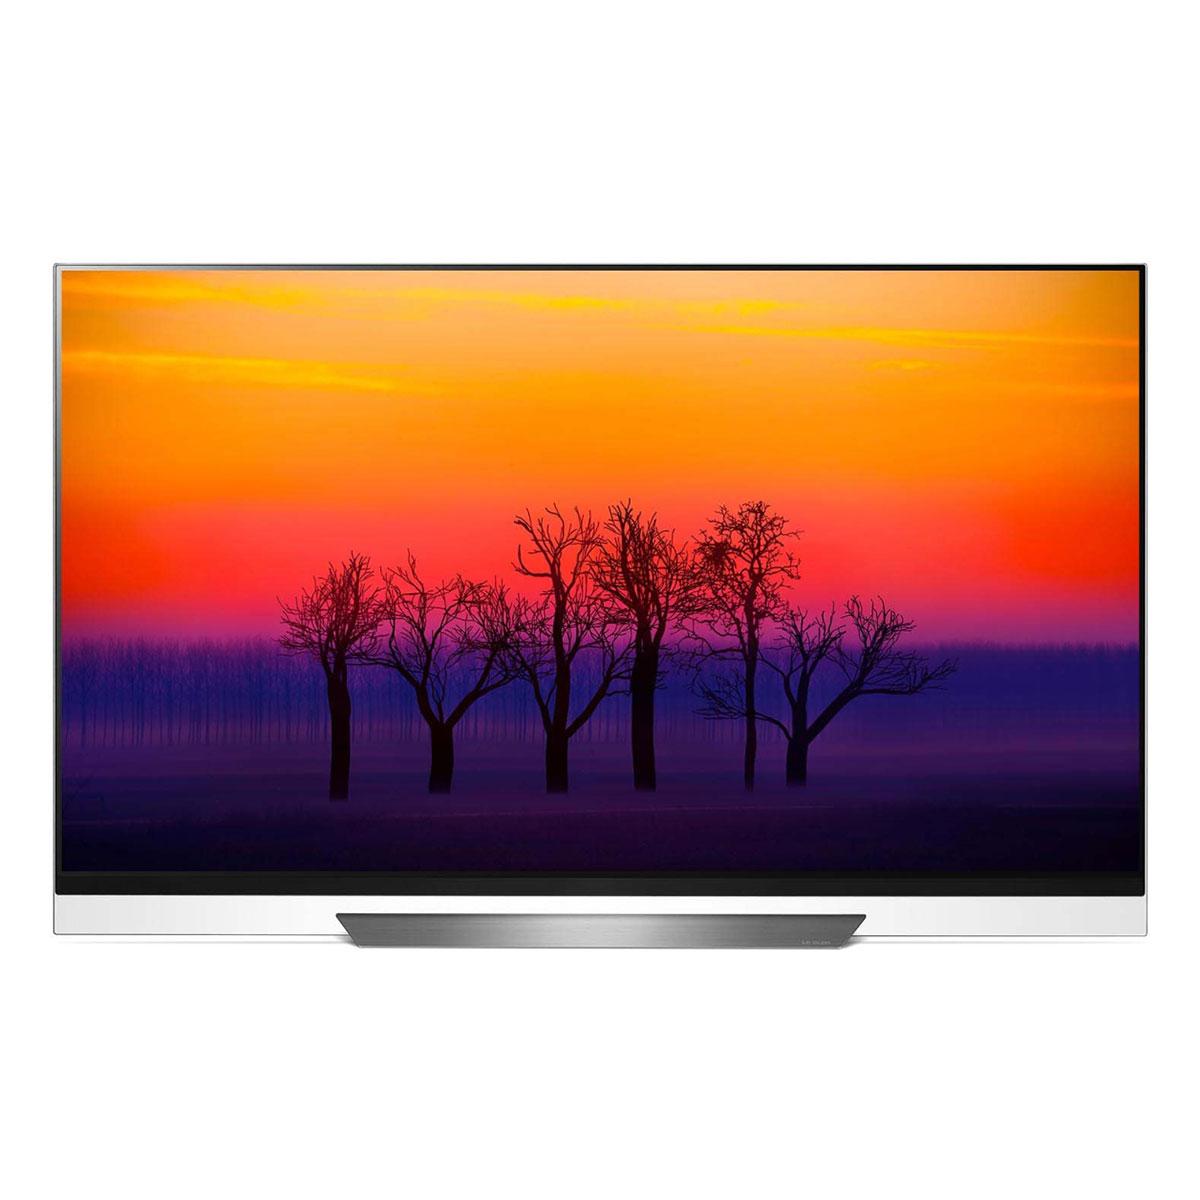 "TV LG OLED55E8 Téléviseur OLED 4K 55"" (140 cm) 16/9 - 3840 x 2160 pixels - Ultra HD 2160p - HDR - Wi-Fi - Bluetooth - Dolby Atmos (dalle native 100 Hz)"